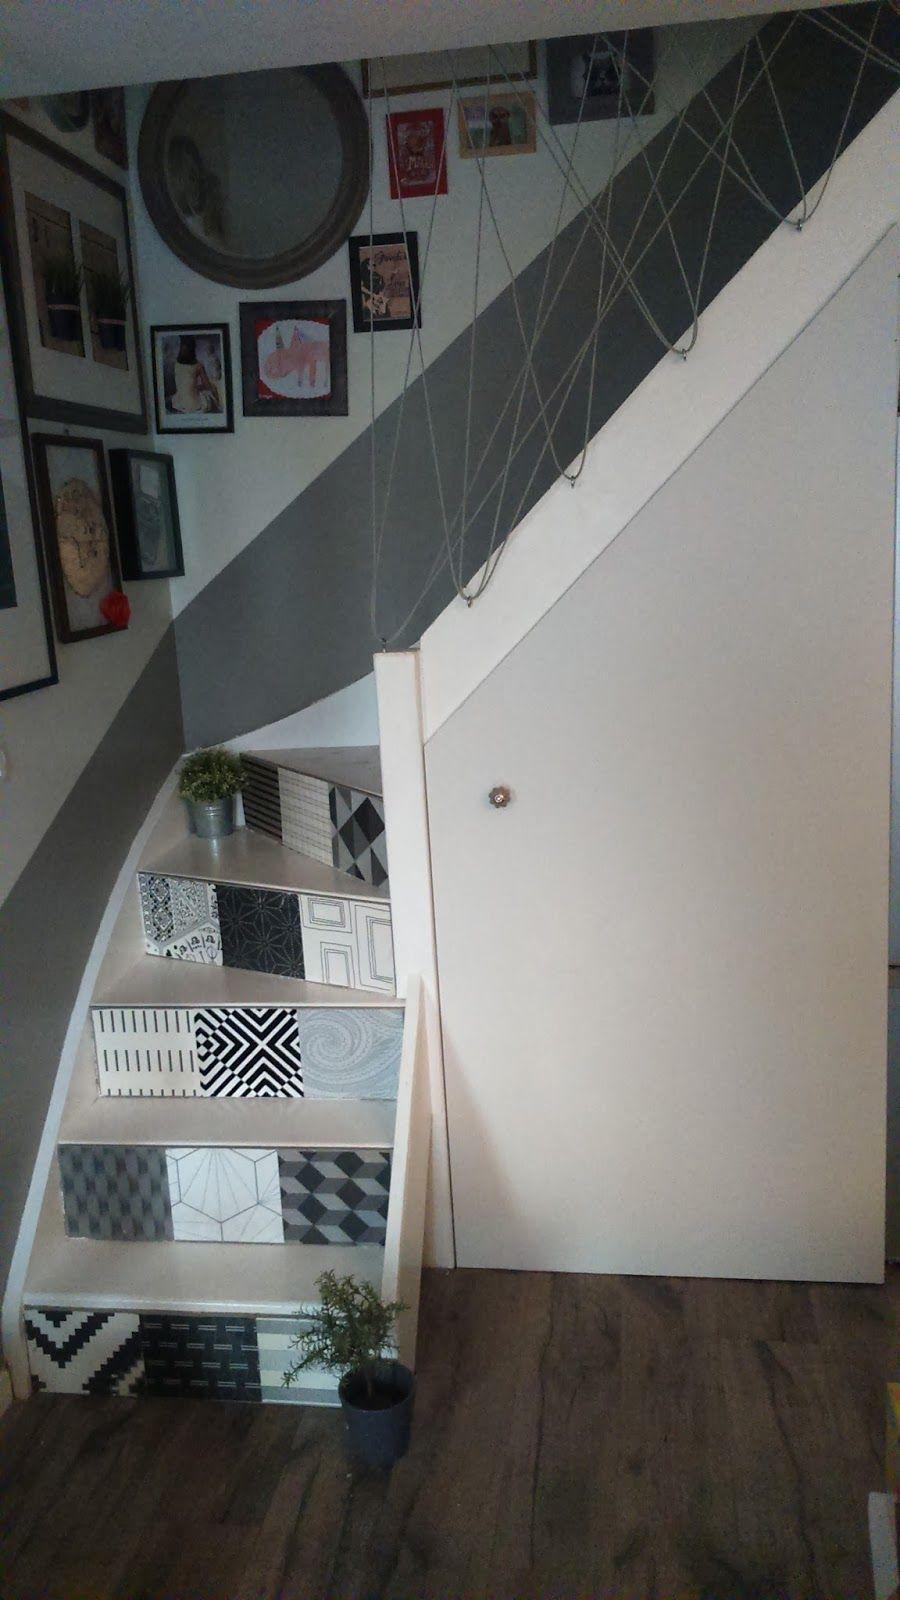 Moderniser Son Escalier idée déco diy pour customiser son escalier : cloisonner un coin